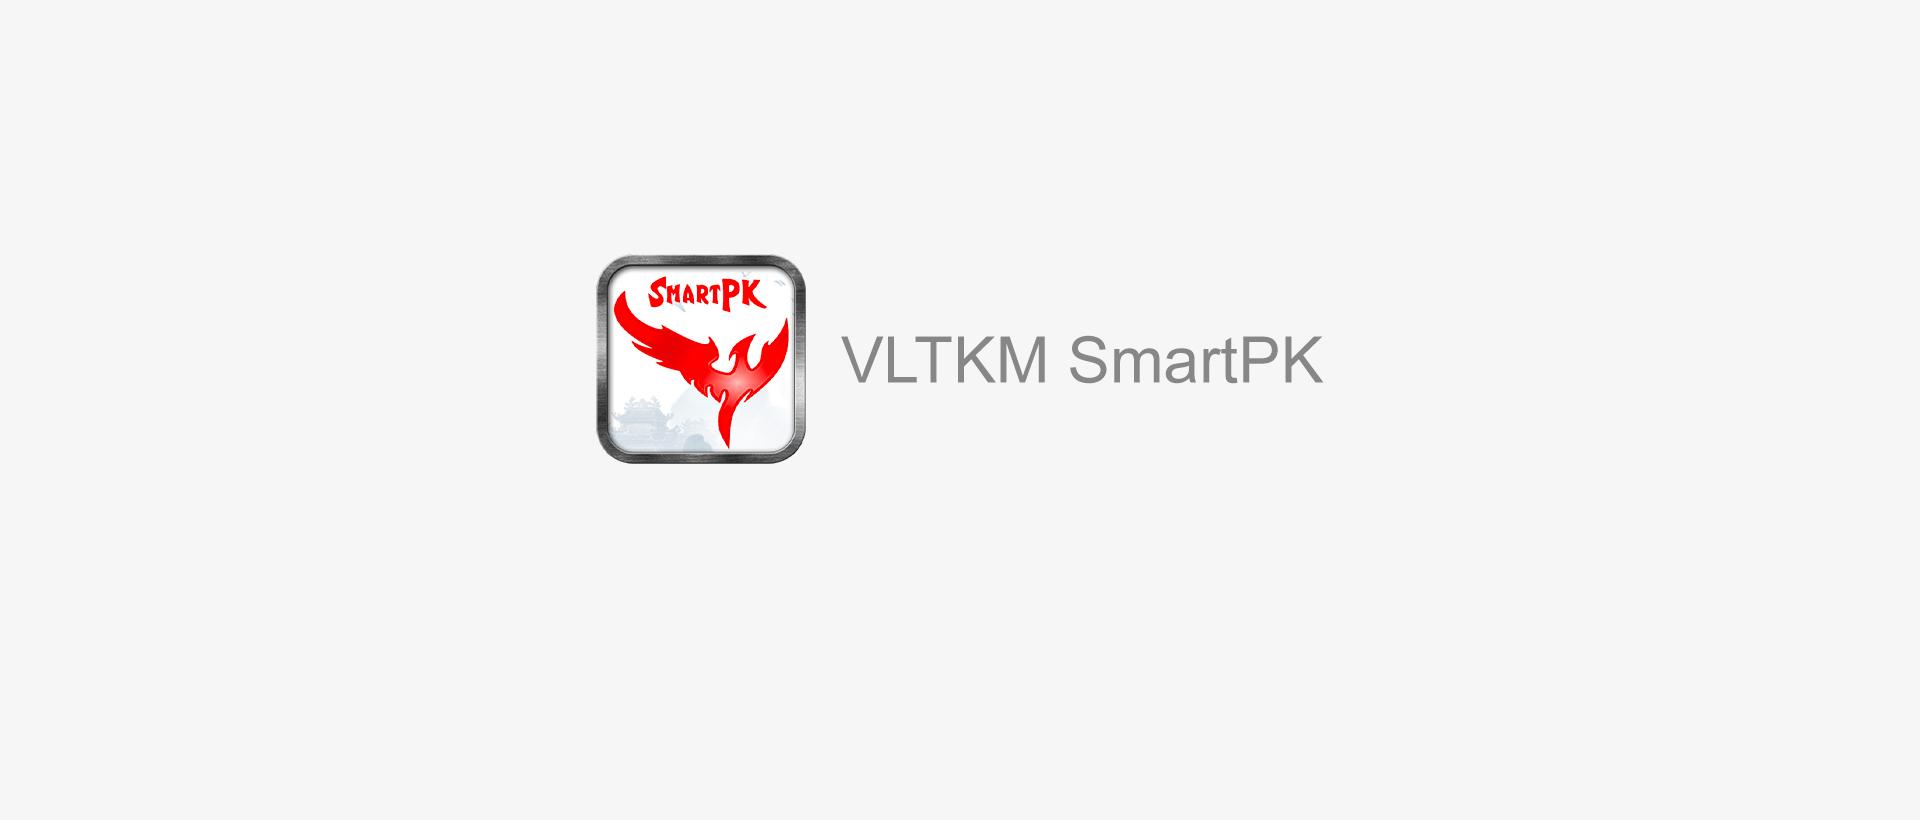 VLTKM SmartPK